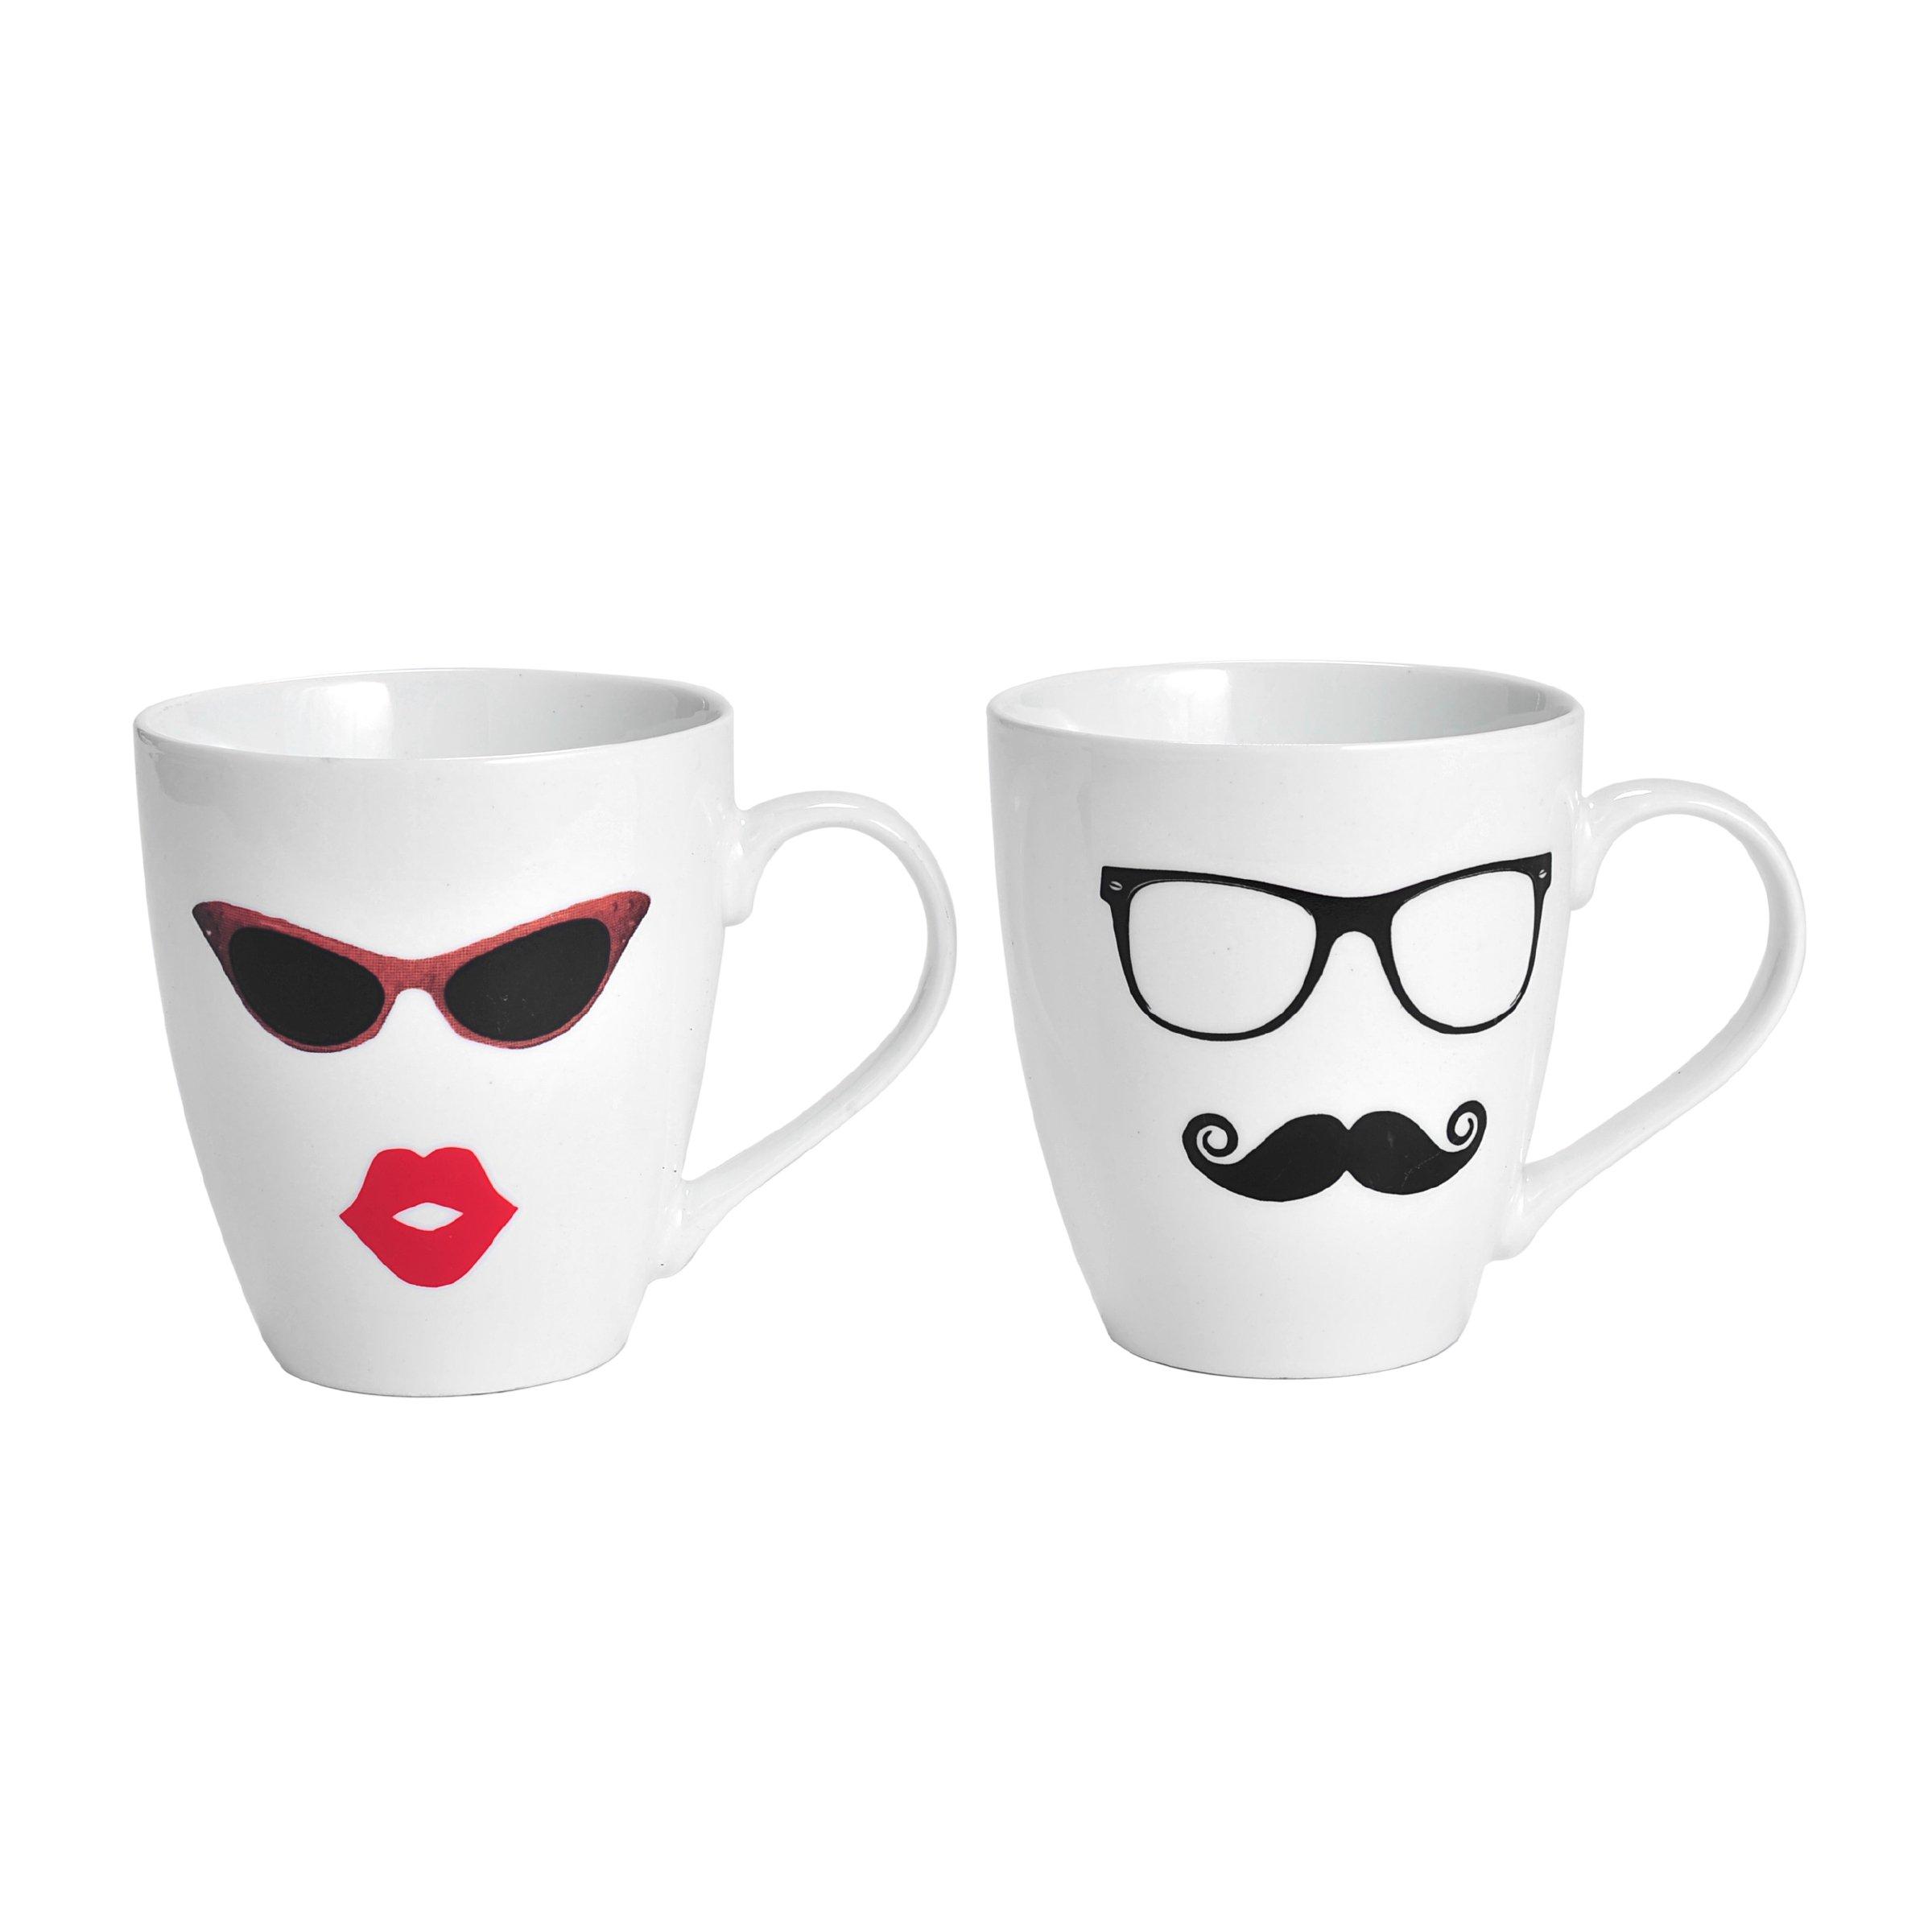 Pfaltzgraff Everyday Mug, Lips and Mustache, Set Of 2 by Pfaltzgraff